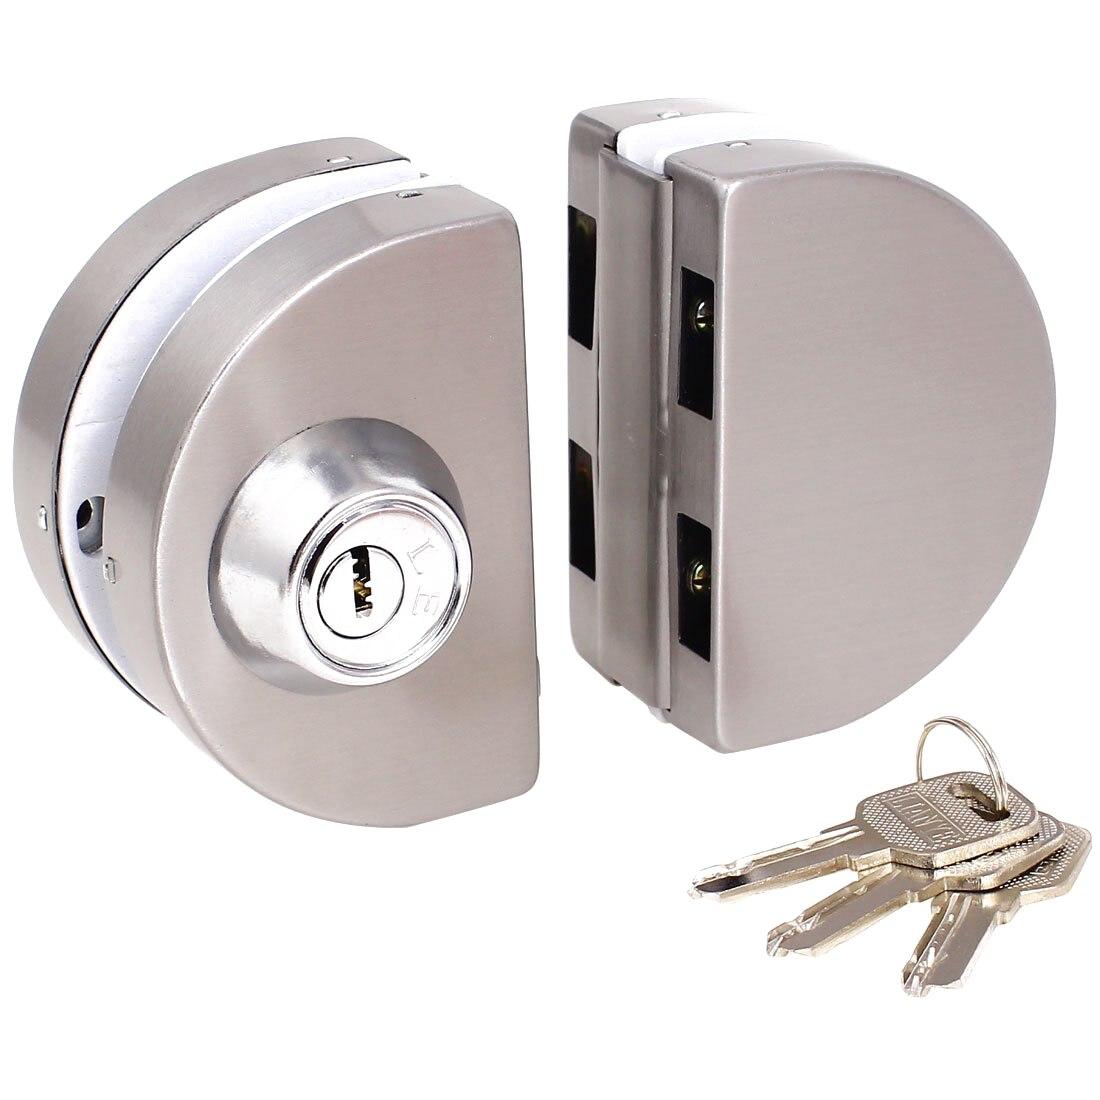 Entry Gate 10-12mm Glass Swing Push <font><b>Sliding</b></font> Door Lock with Keys